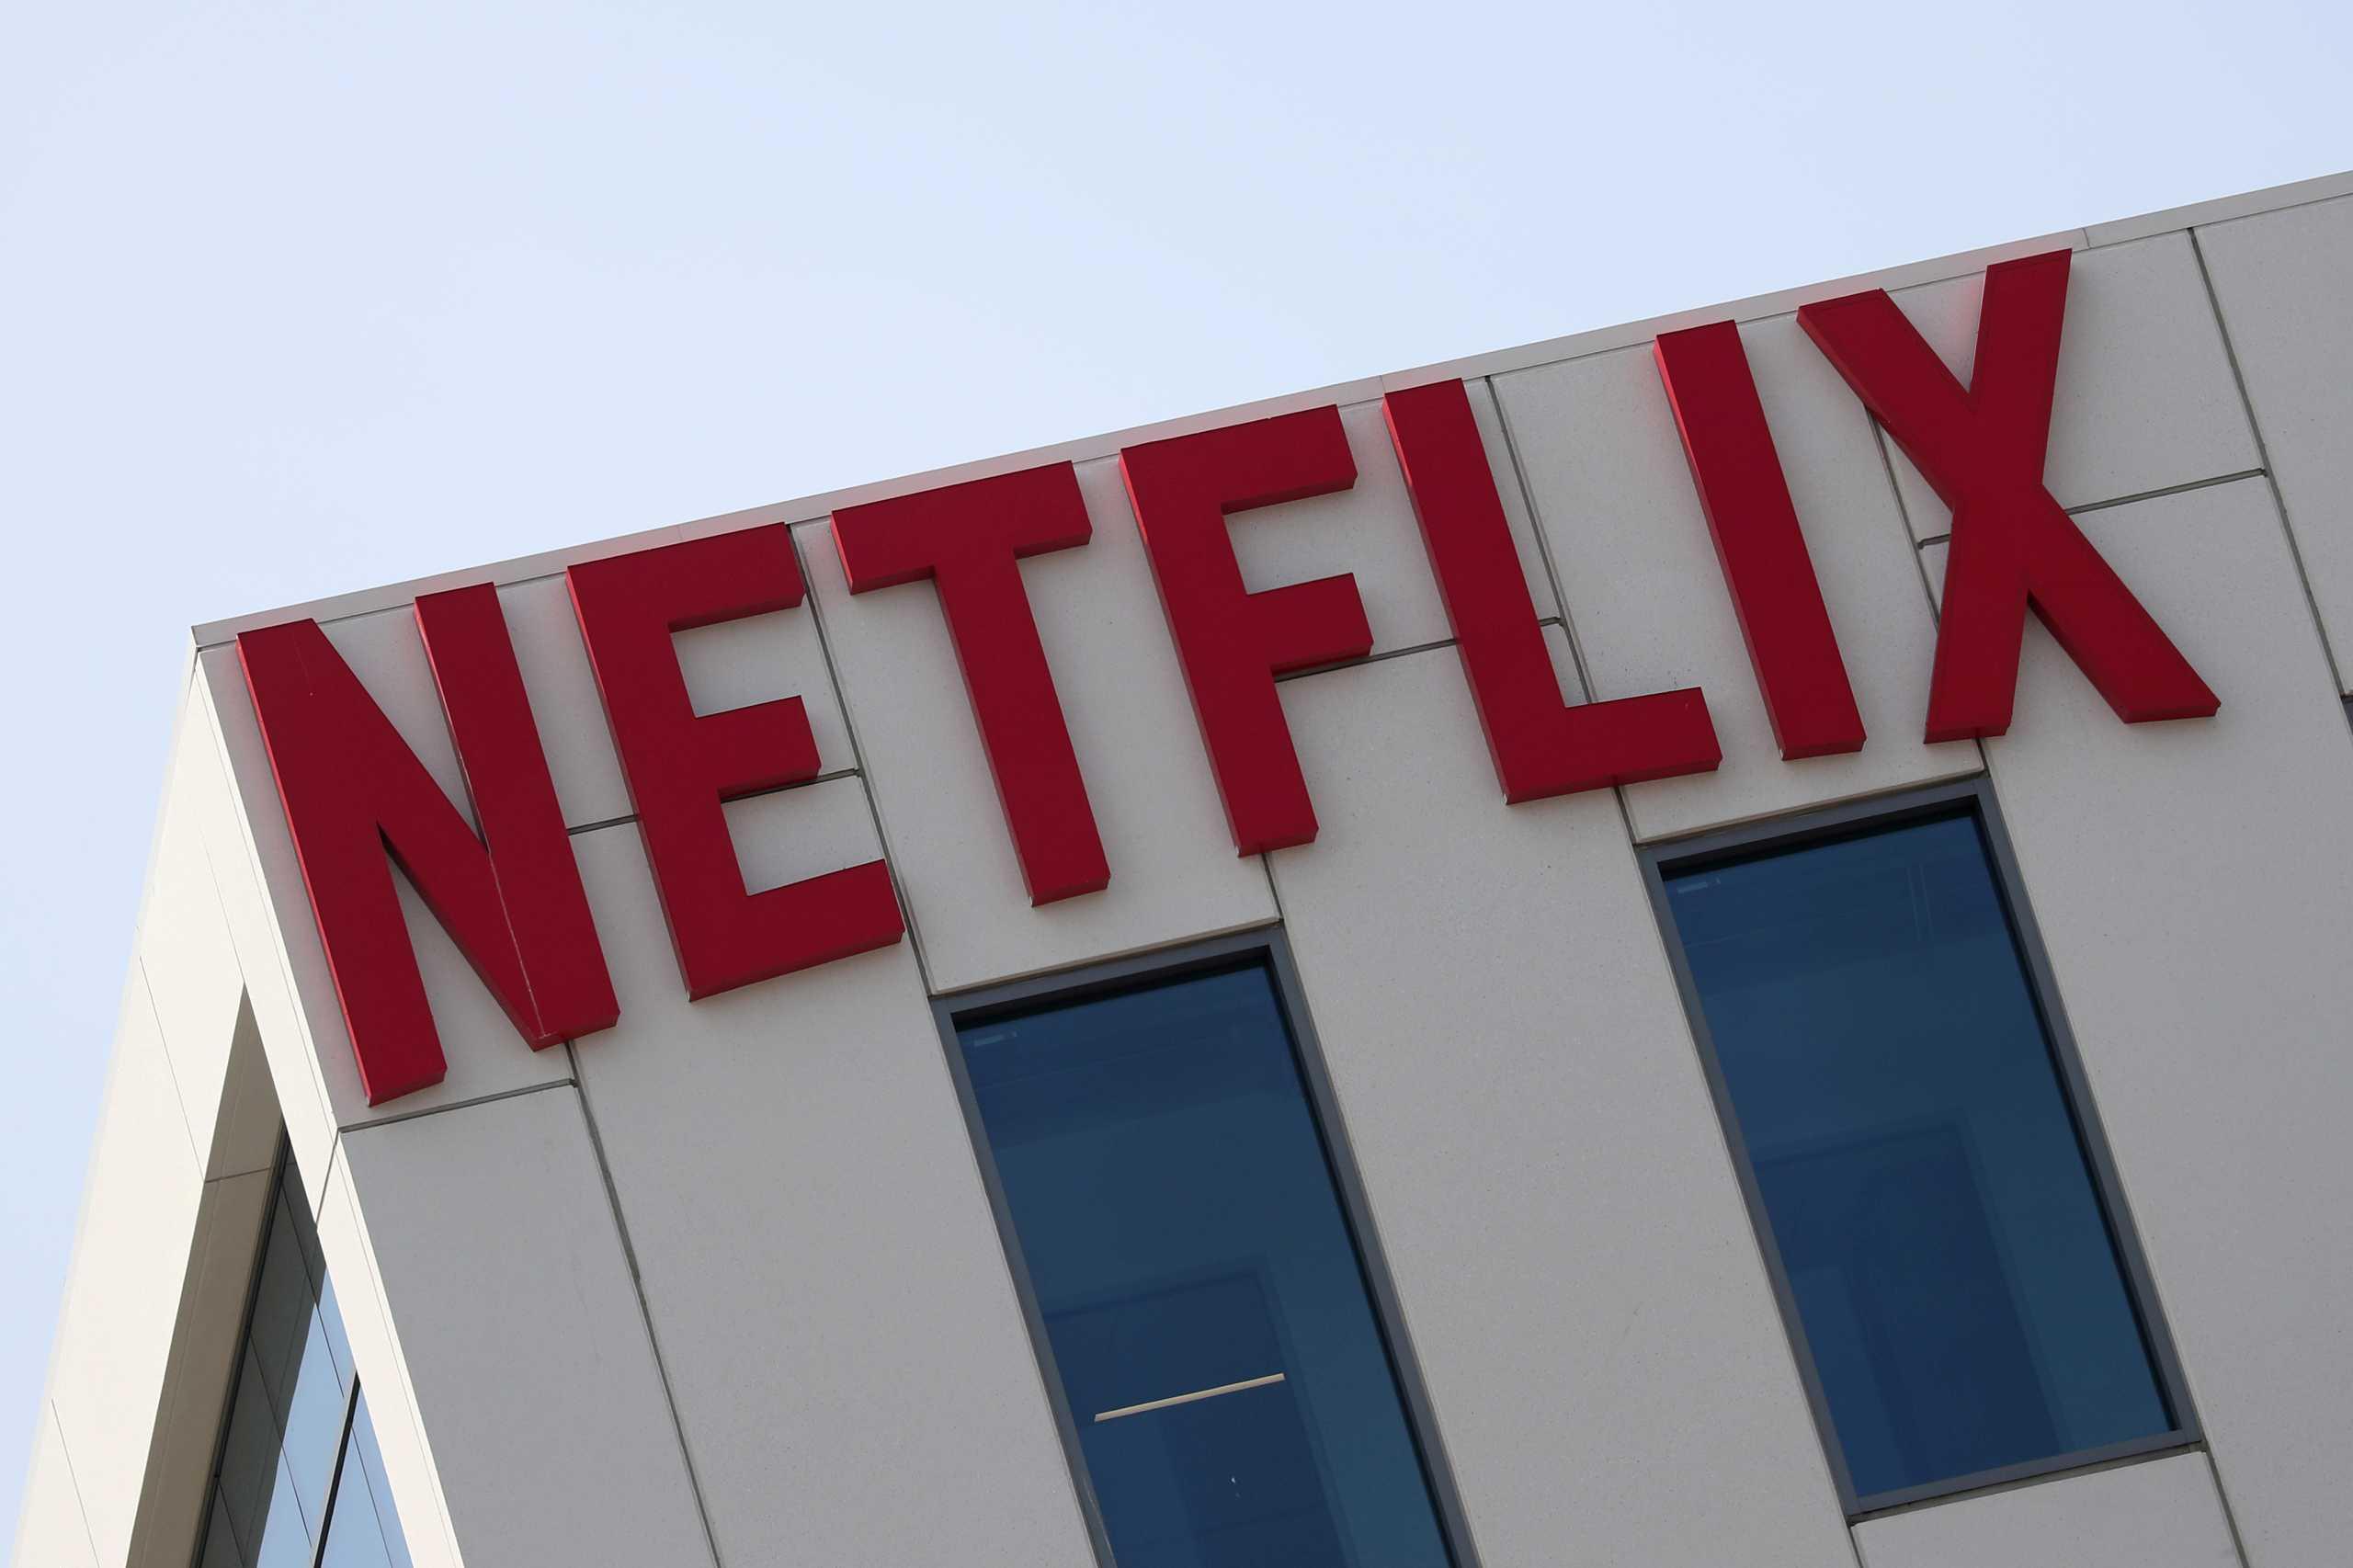 Netflix: Μέιωση του ρυθμού νέων συνδρομών και «βουτιά» της μετοχής